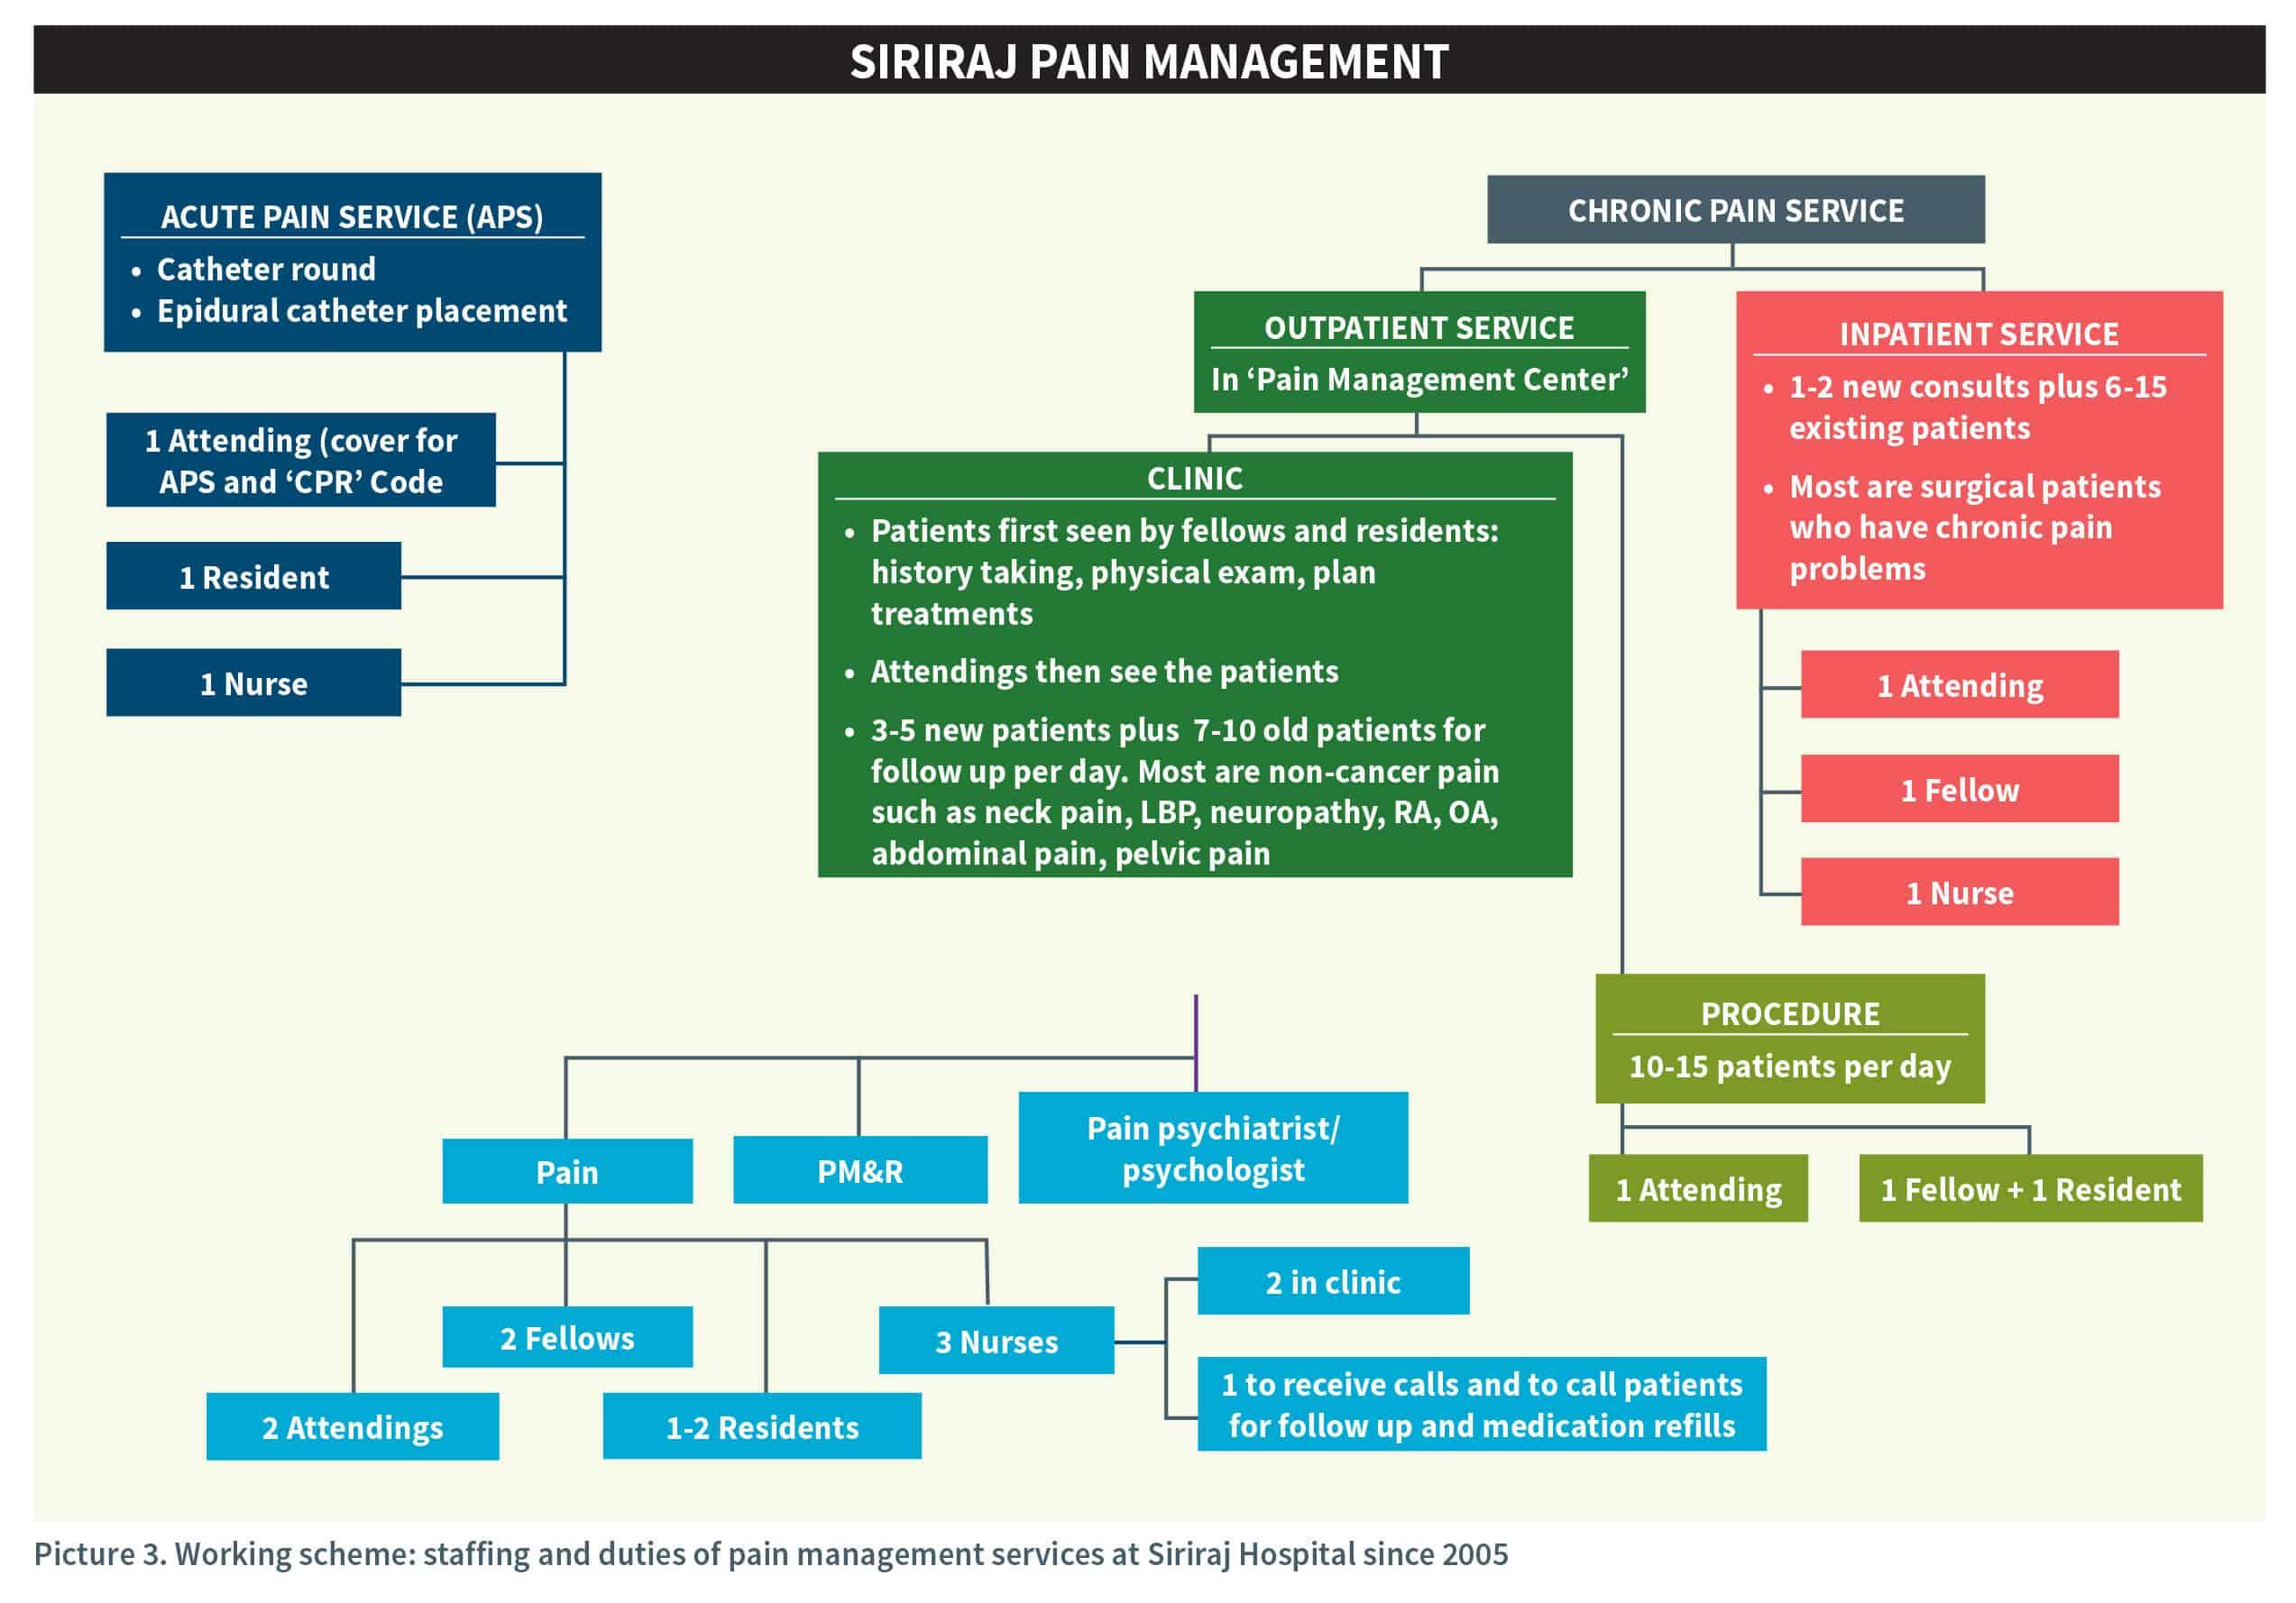 Siriraj Pain Management